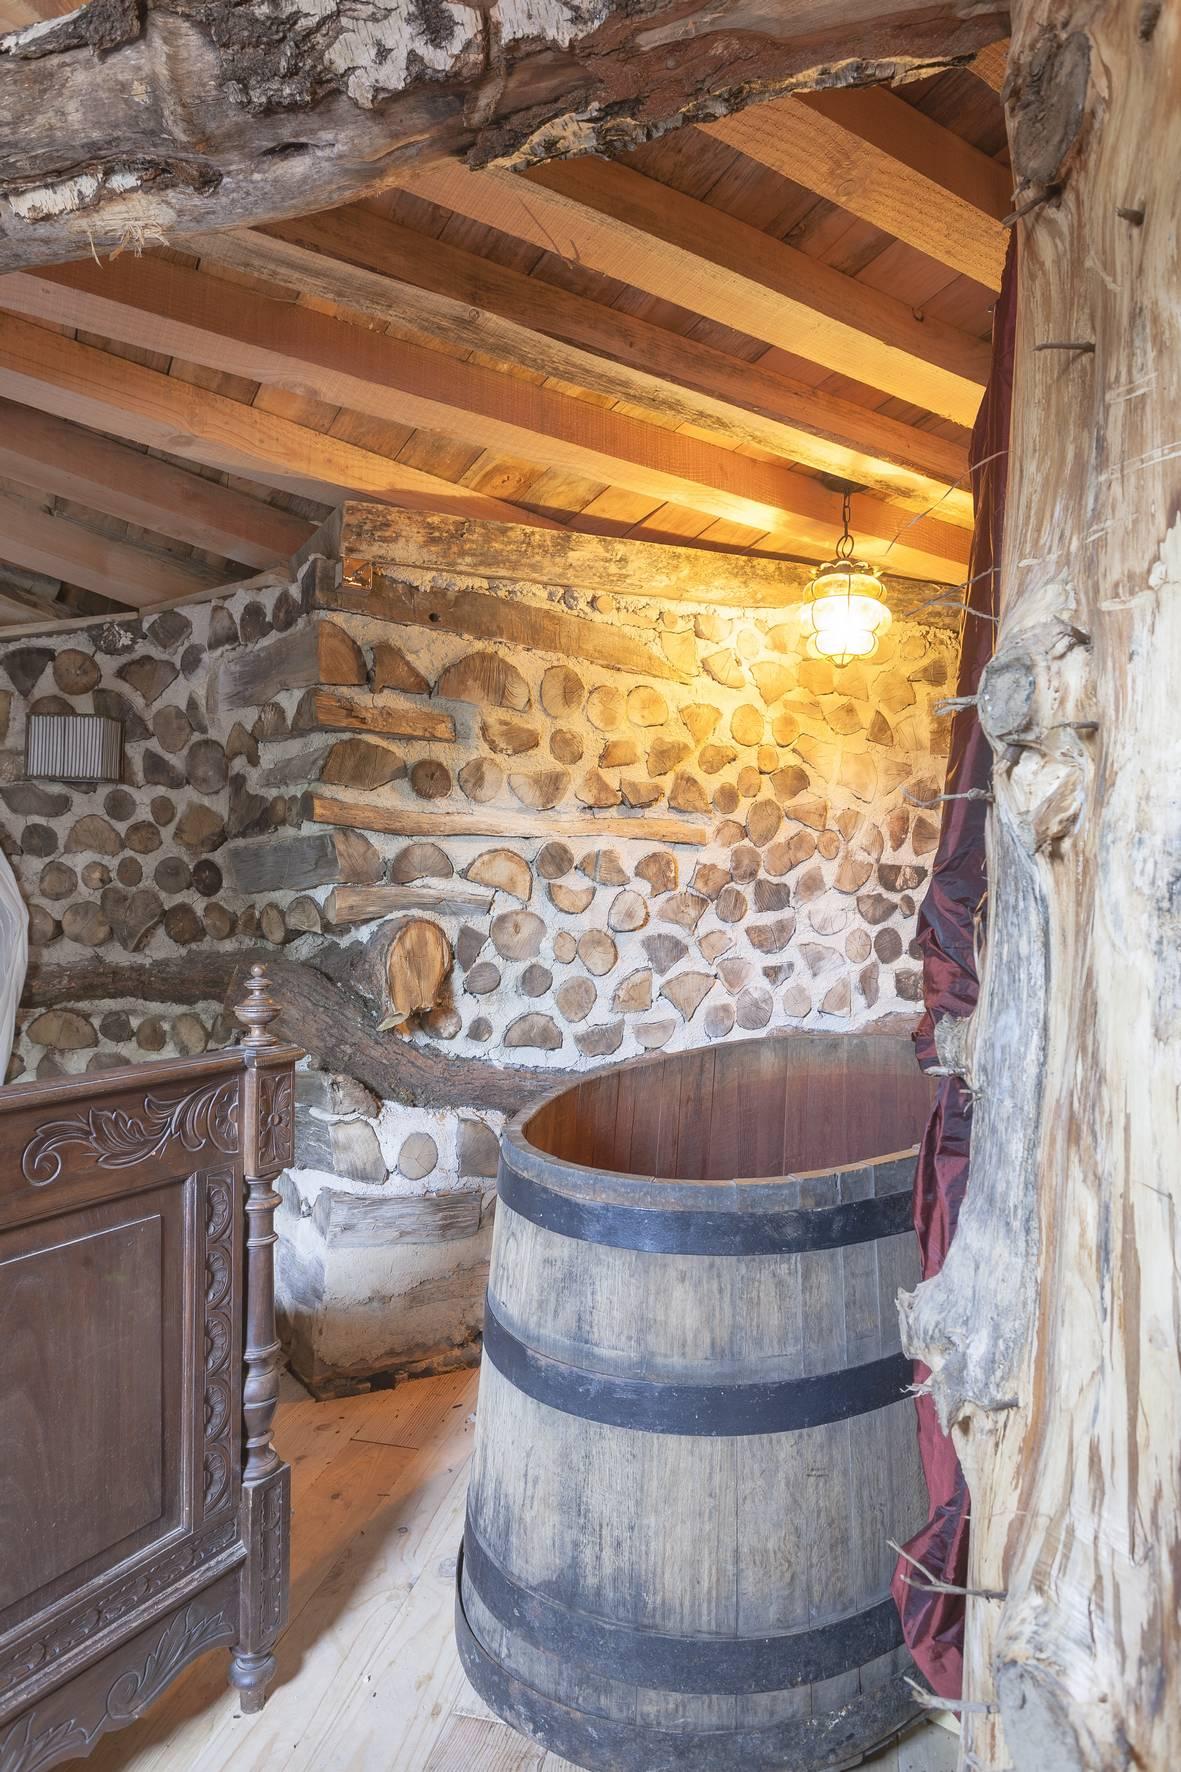 baignoire Hobbit - Domaine de la Pierre Ronde © E.Correia